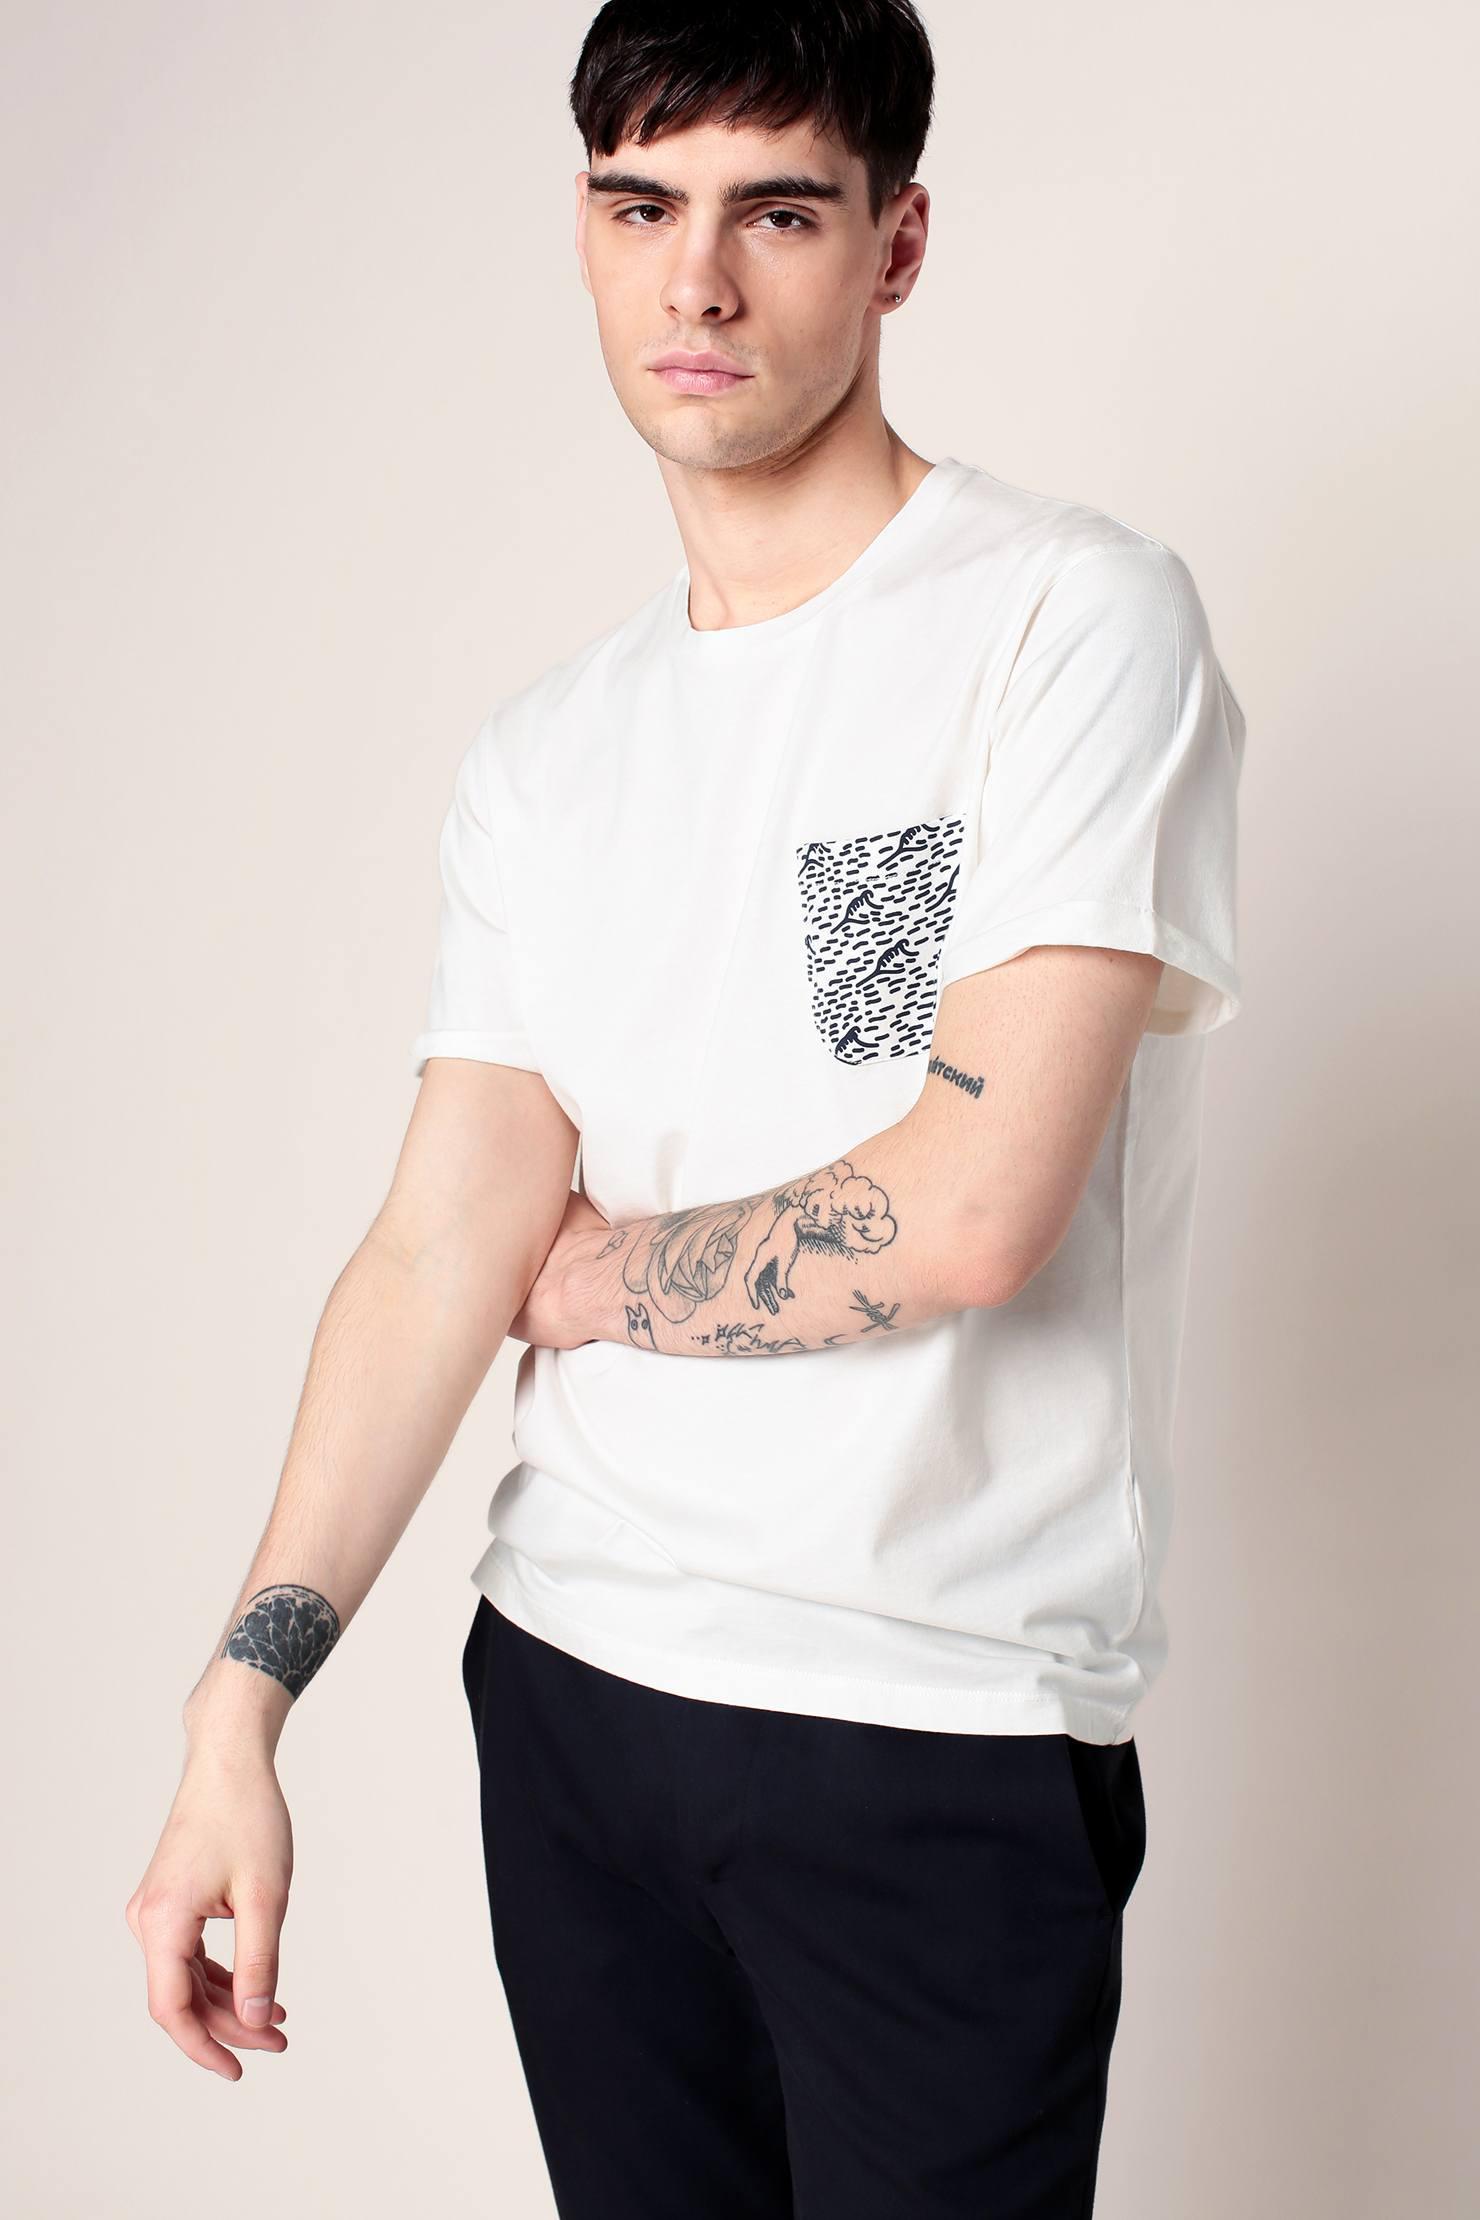 lyst cuisse de grenouille t shirt in white for men. Black Bedroom Furniture Sets. Home Design Ideas